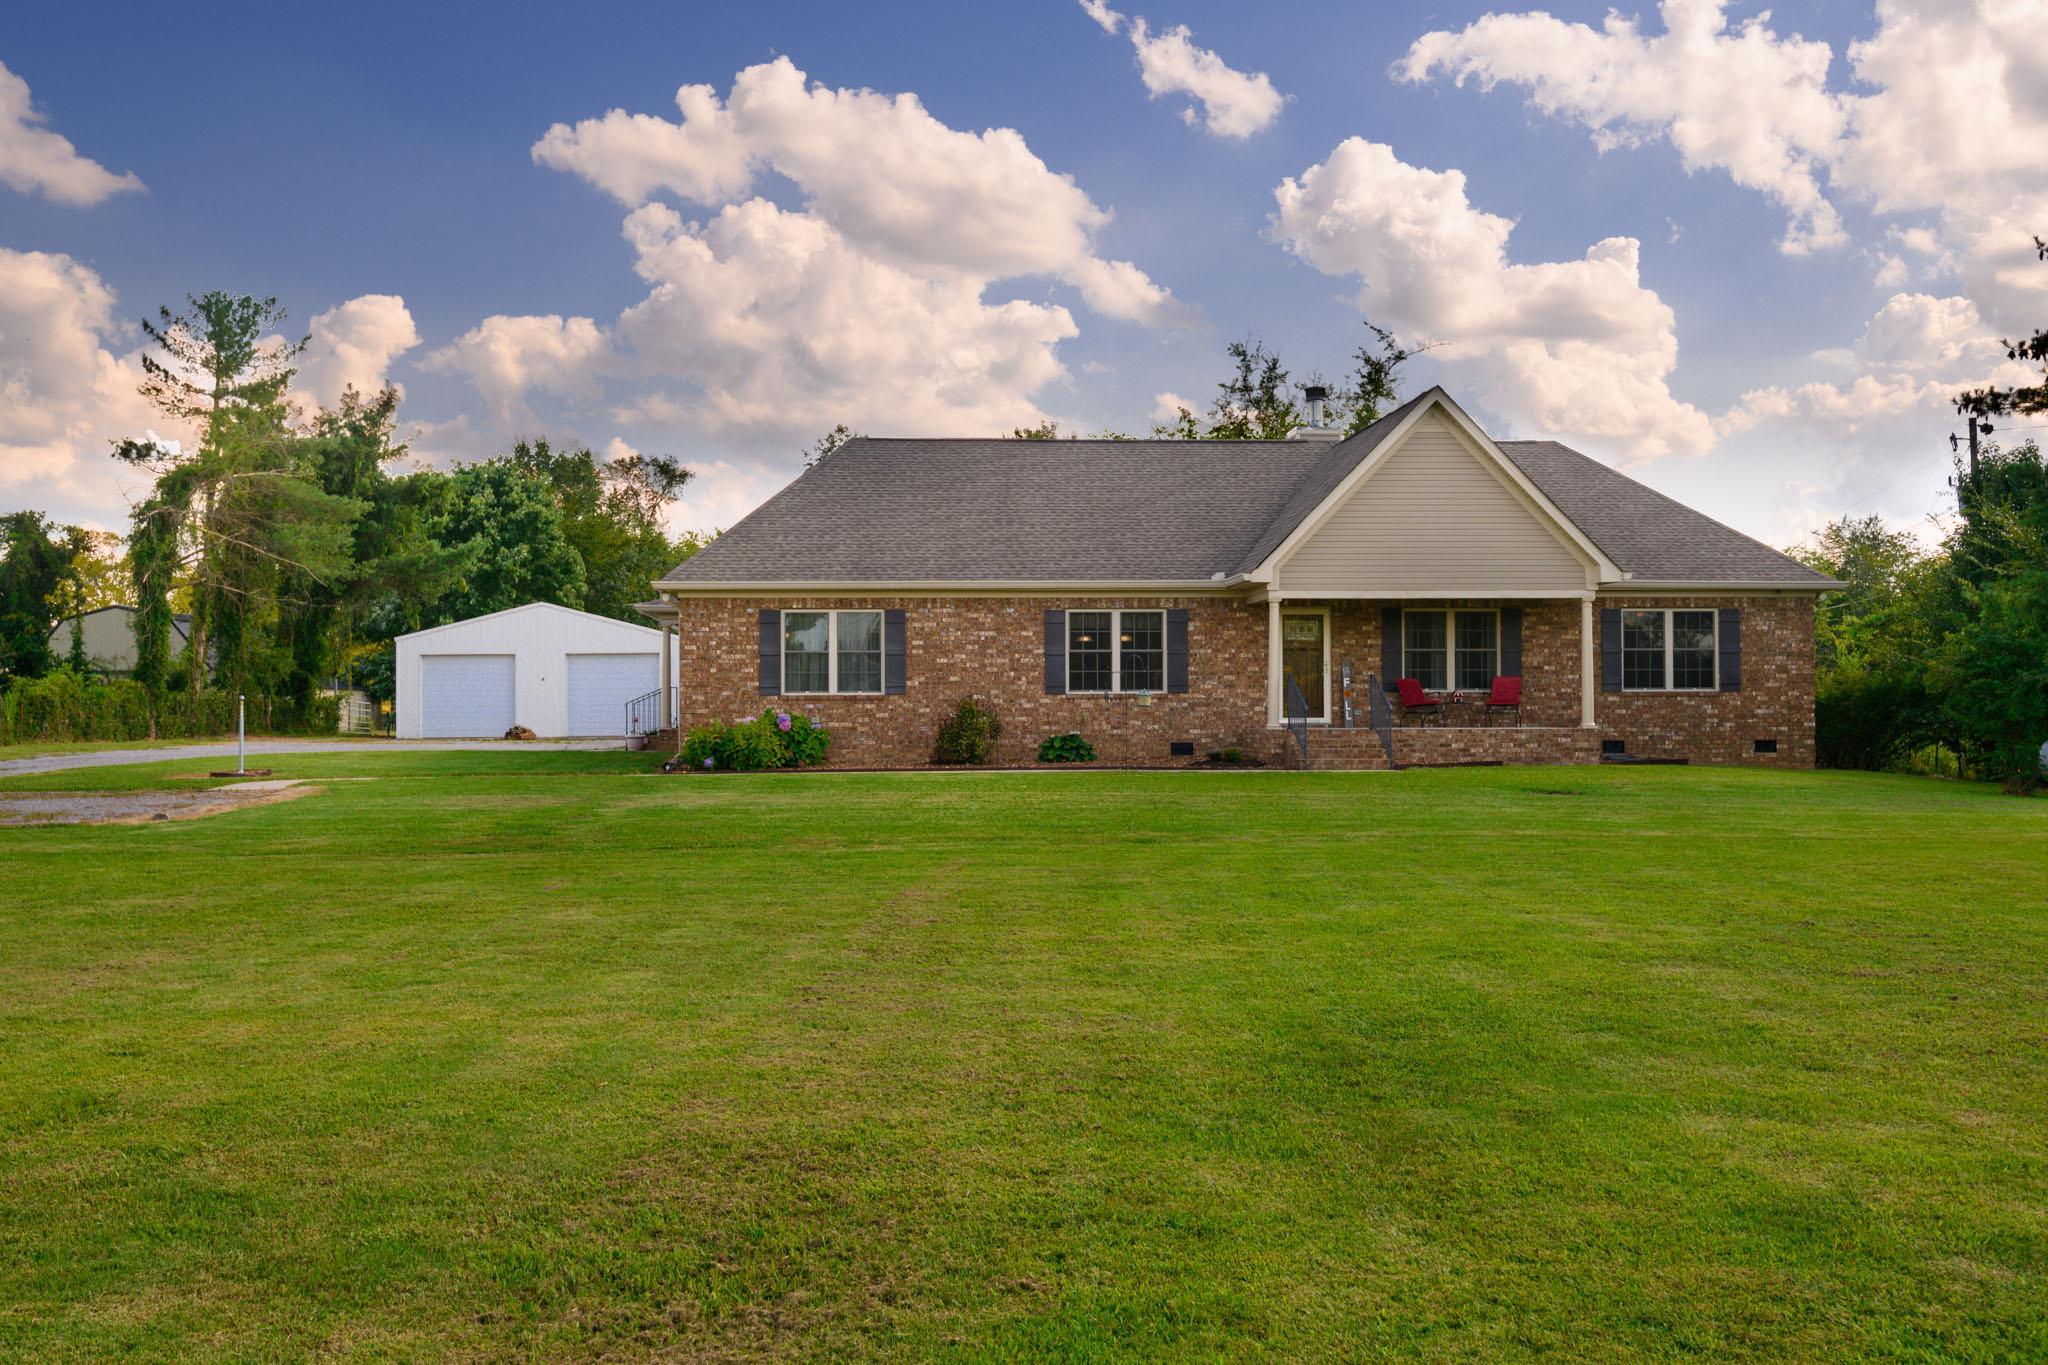 4830 Cedar Grove Rd, Murfreesboro, TN 37127 - Murfreesboro, TN real estate listing